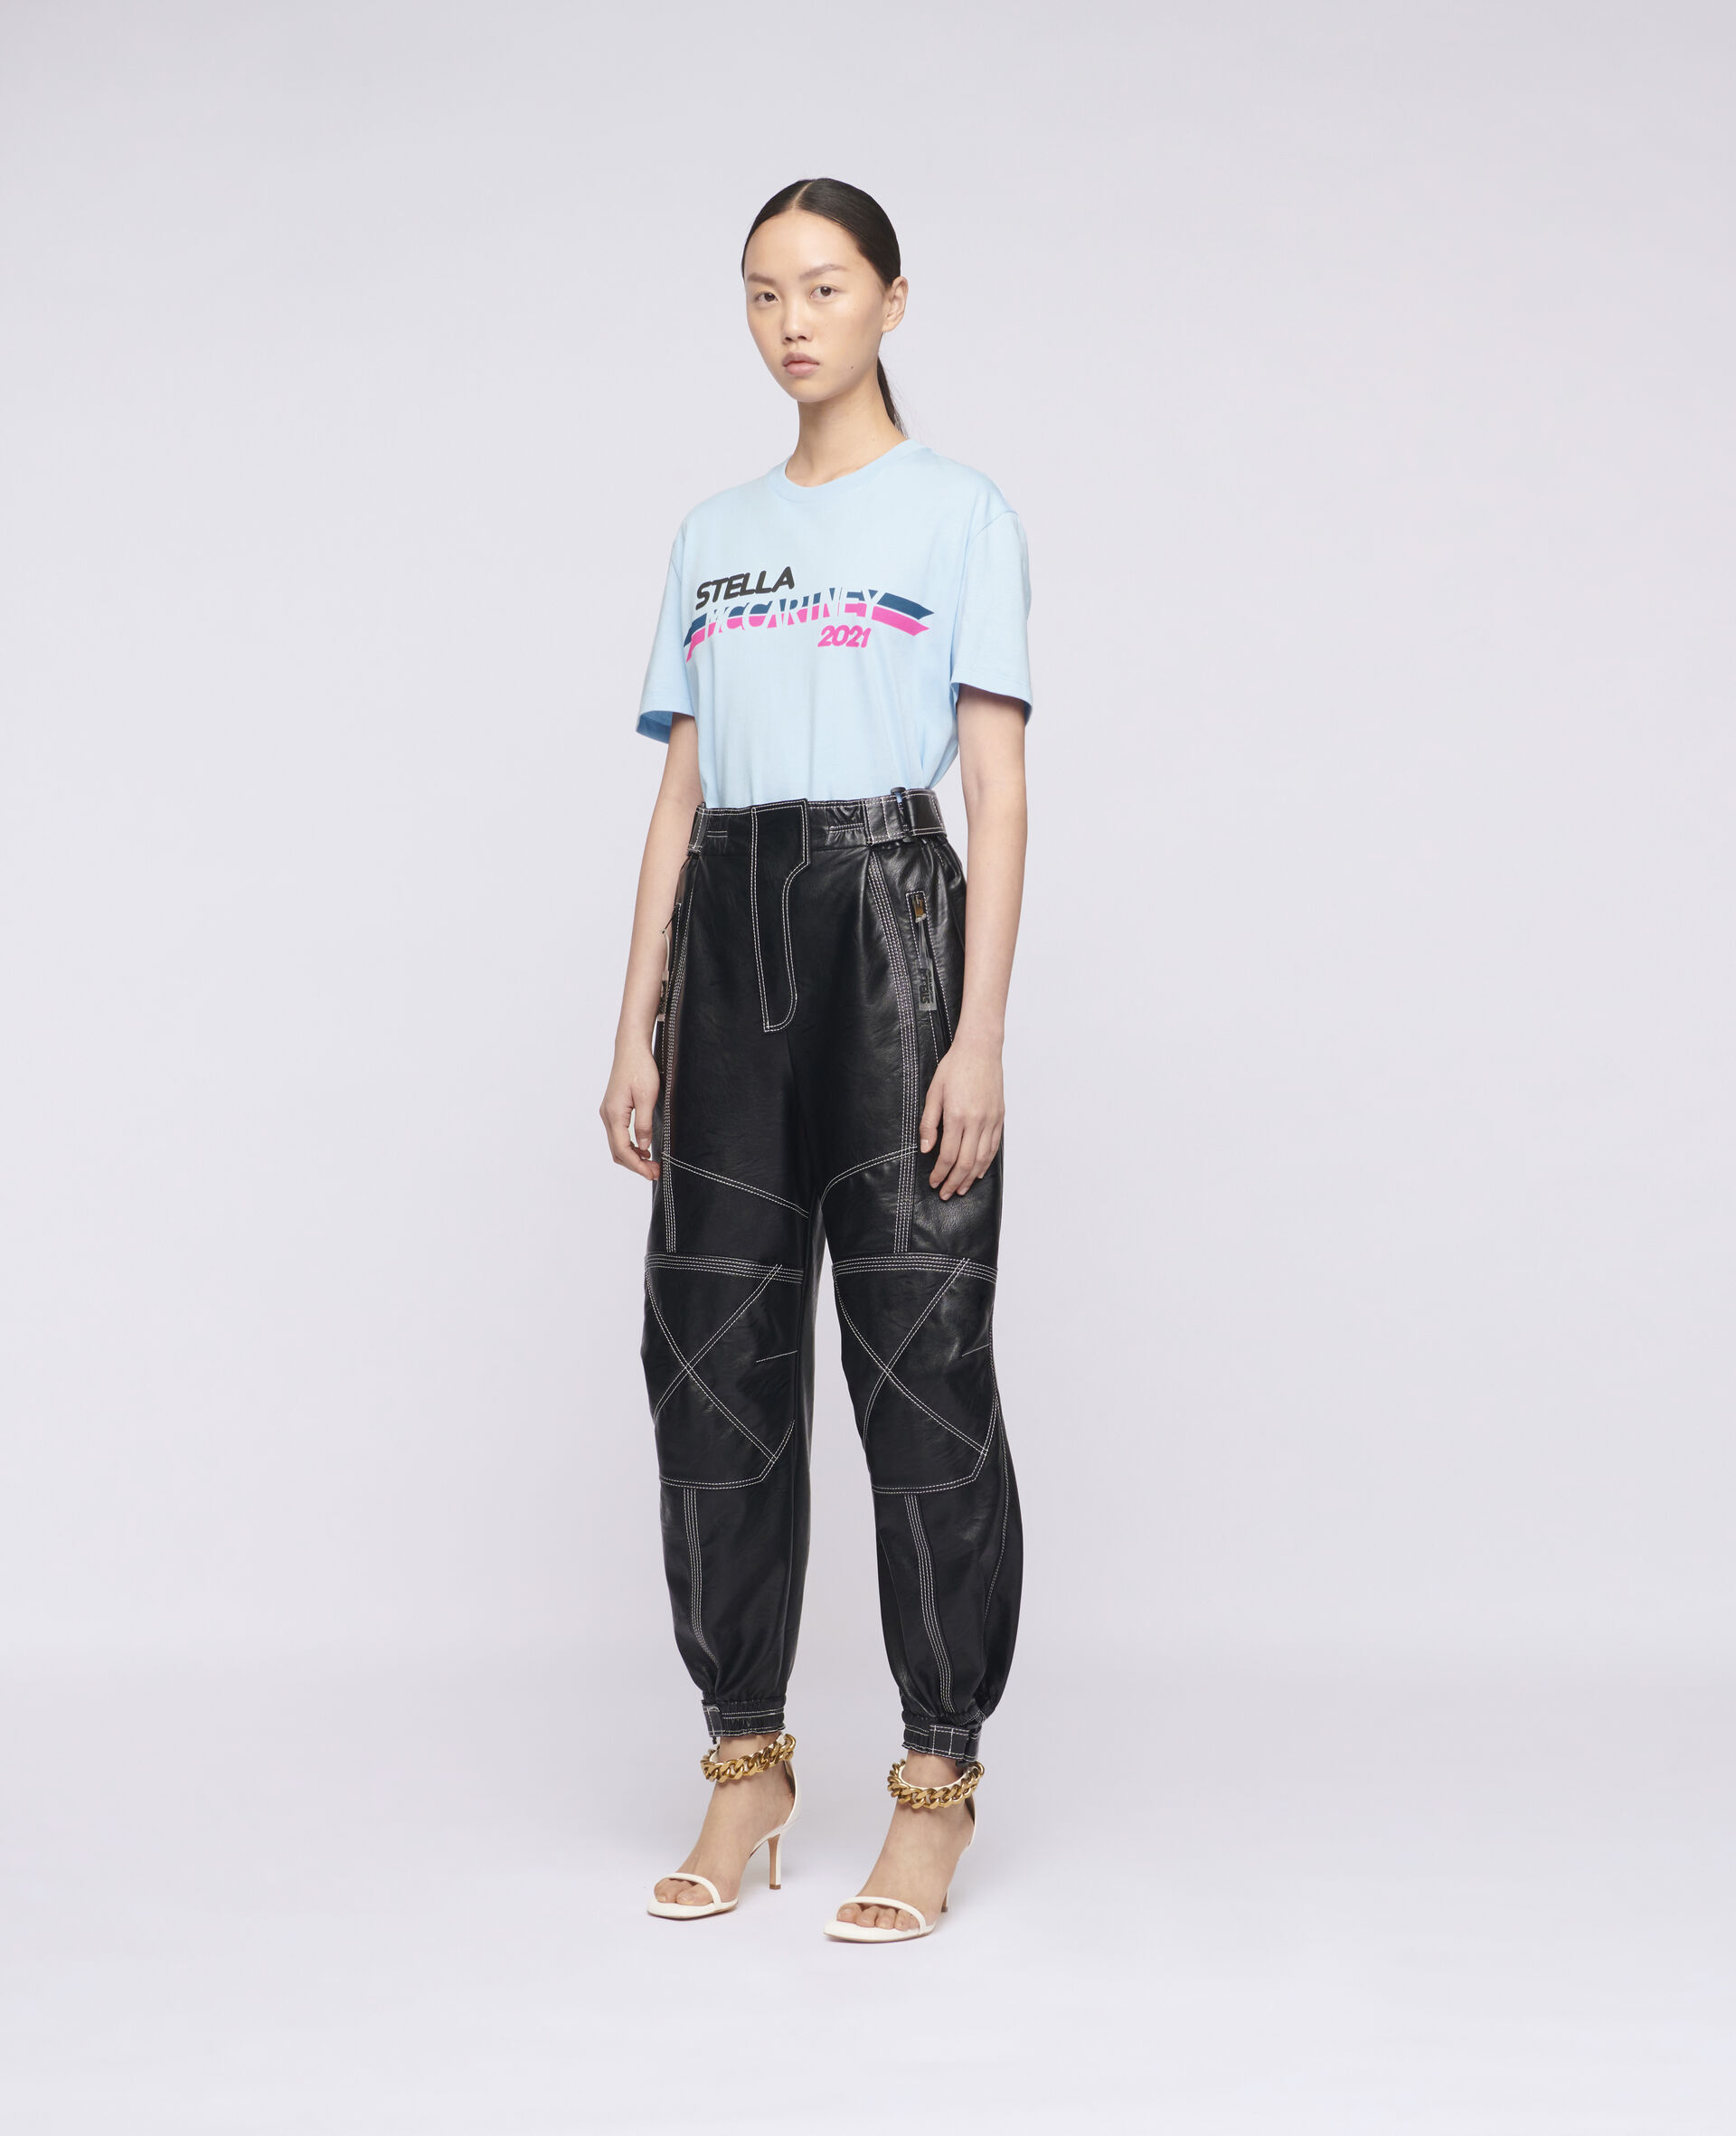 Stella McCartney 2021 徽标 T 恤-蓝色-large image number 1